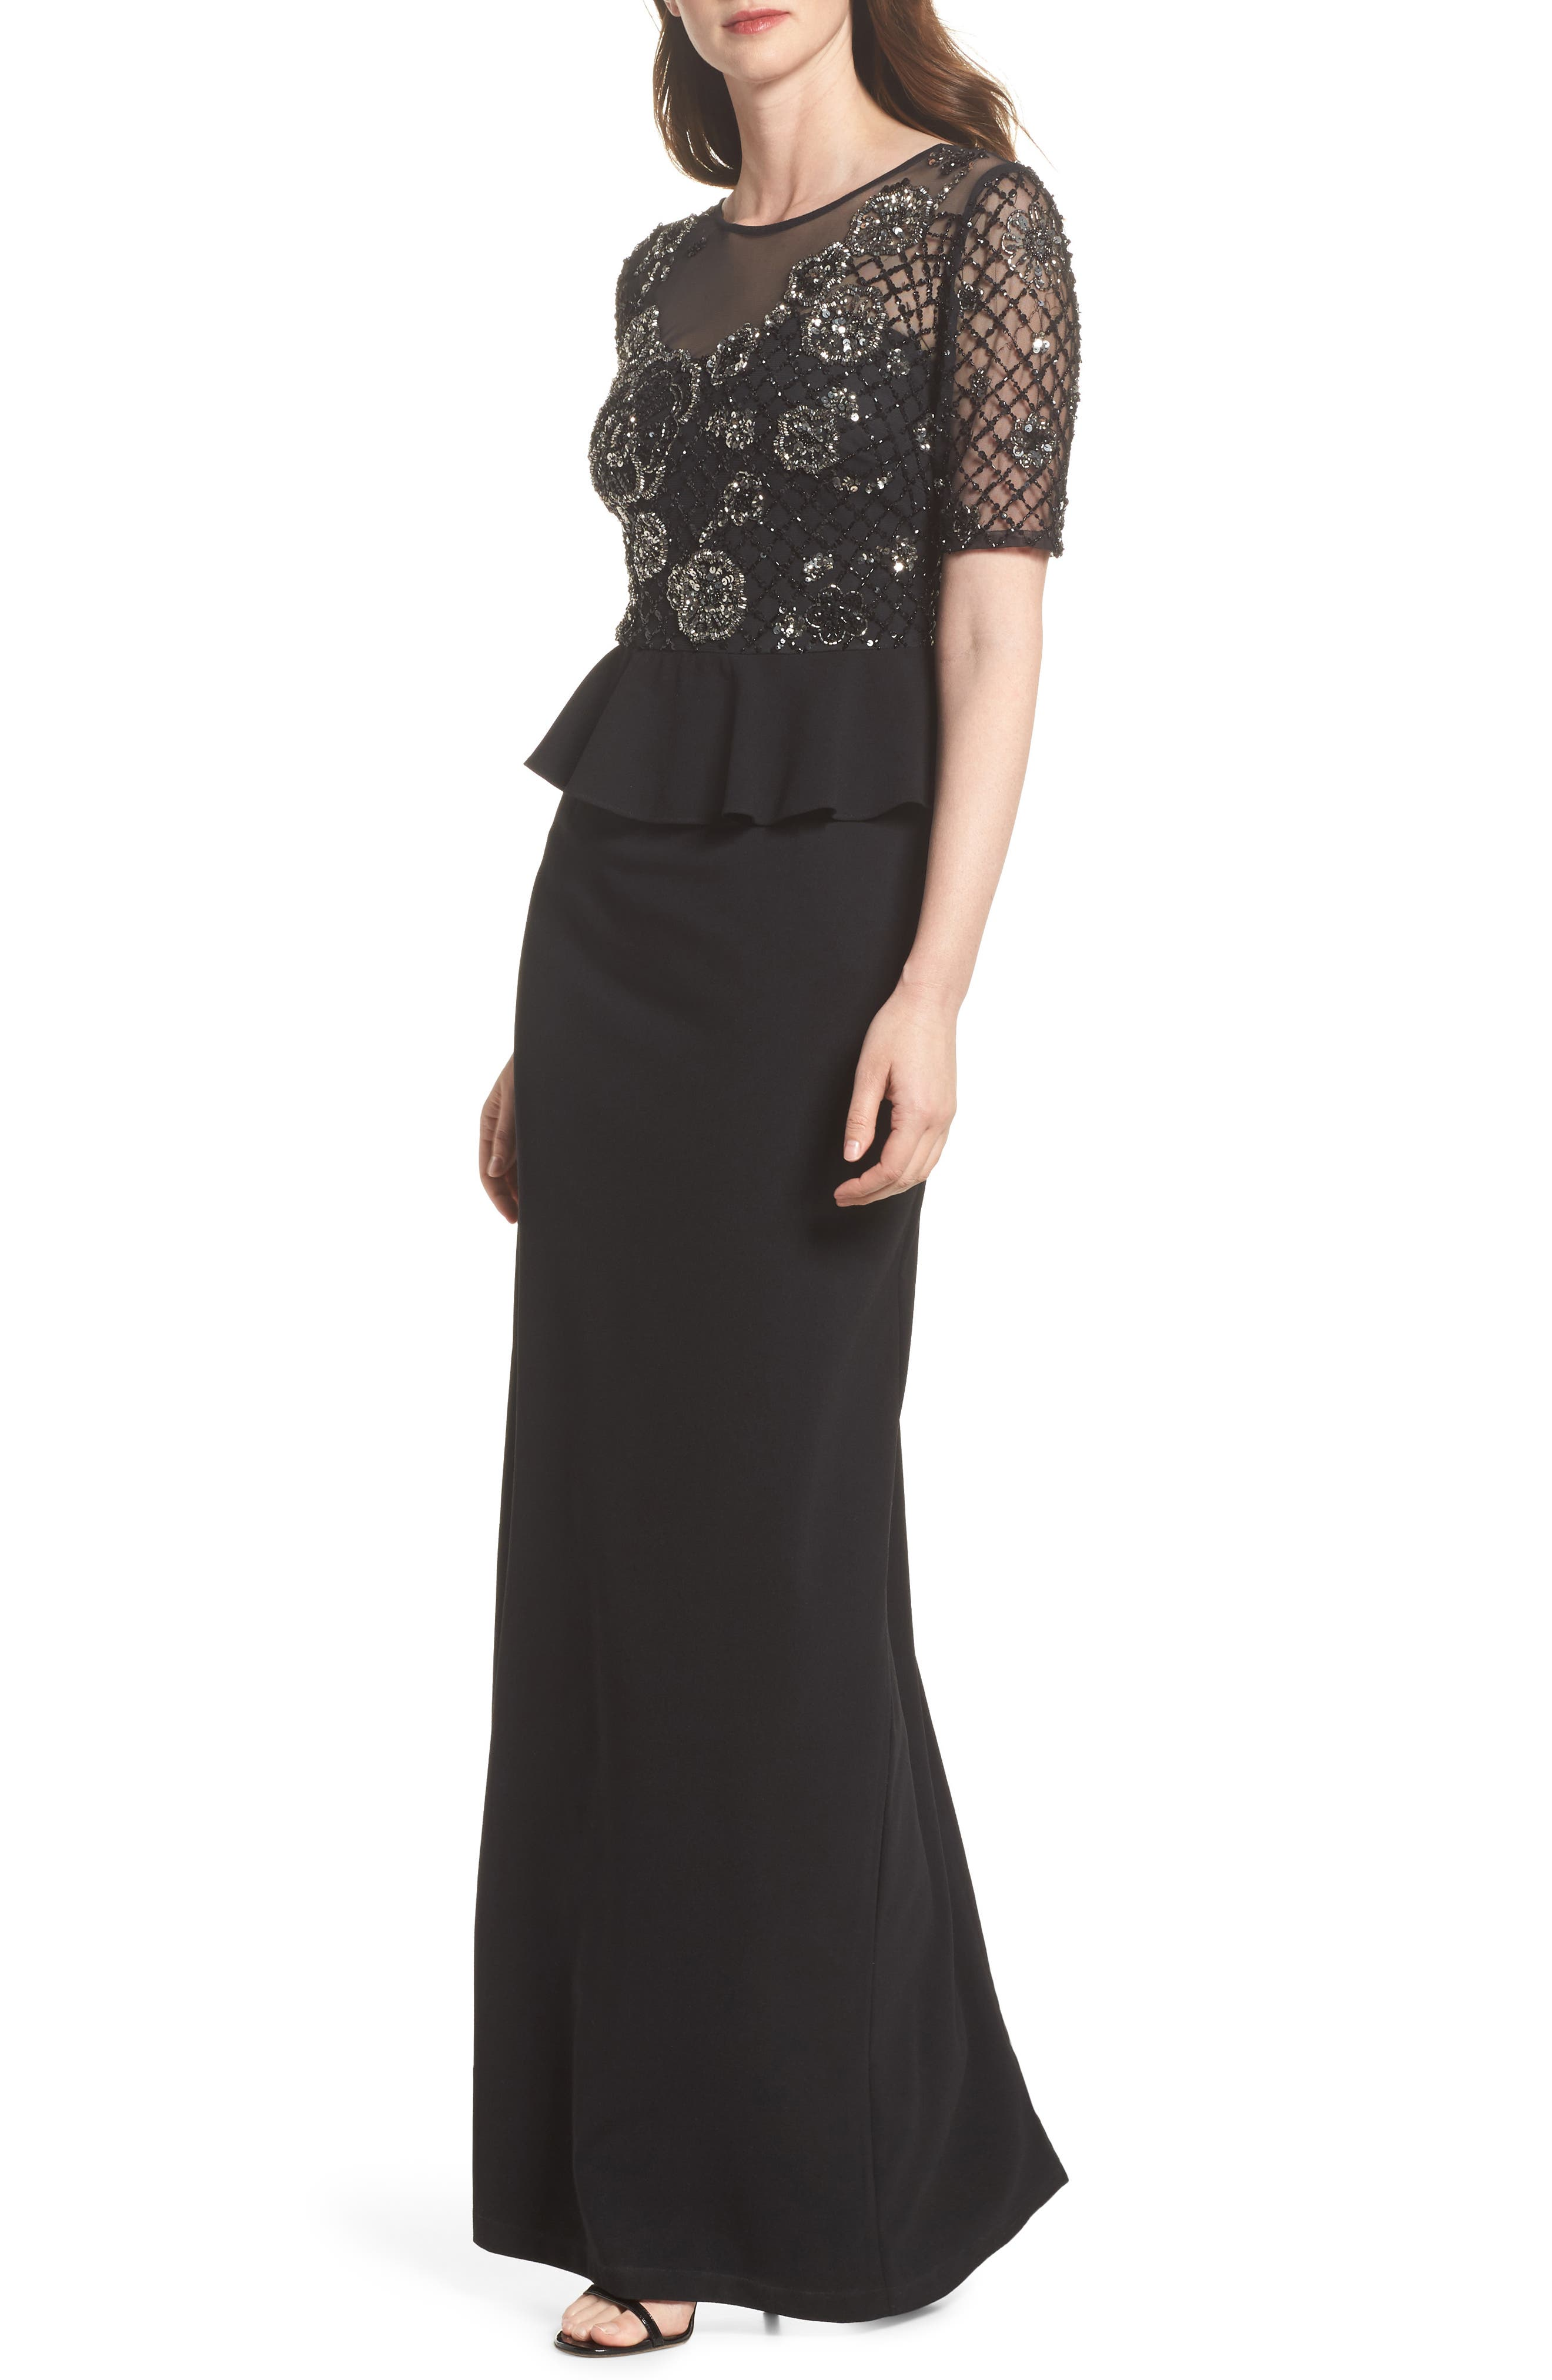 Sequin Peplum Waist Column Gown,                             Main thumbnail 1, color,                             Black/ Mercury